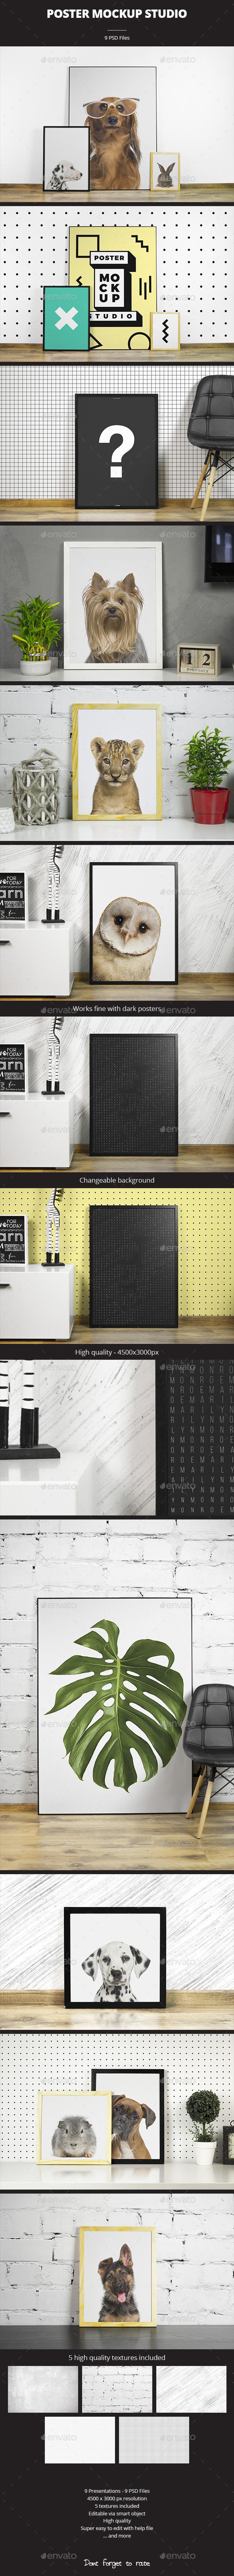 Poster Mockup Studio - Print Product Mock-Ups